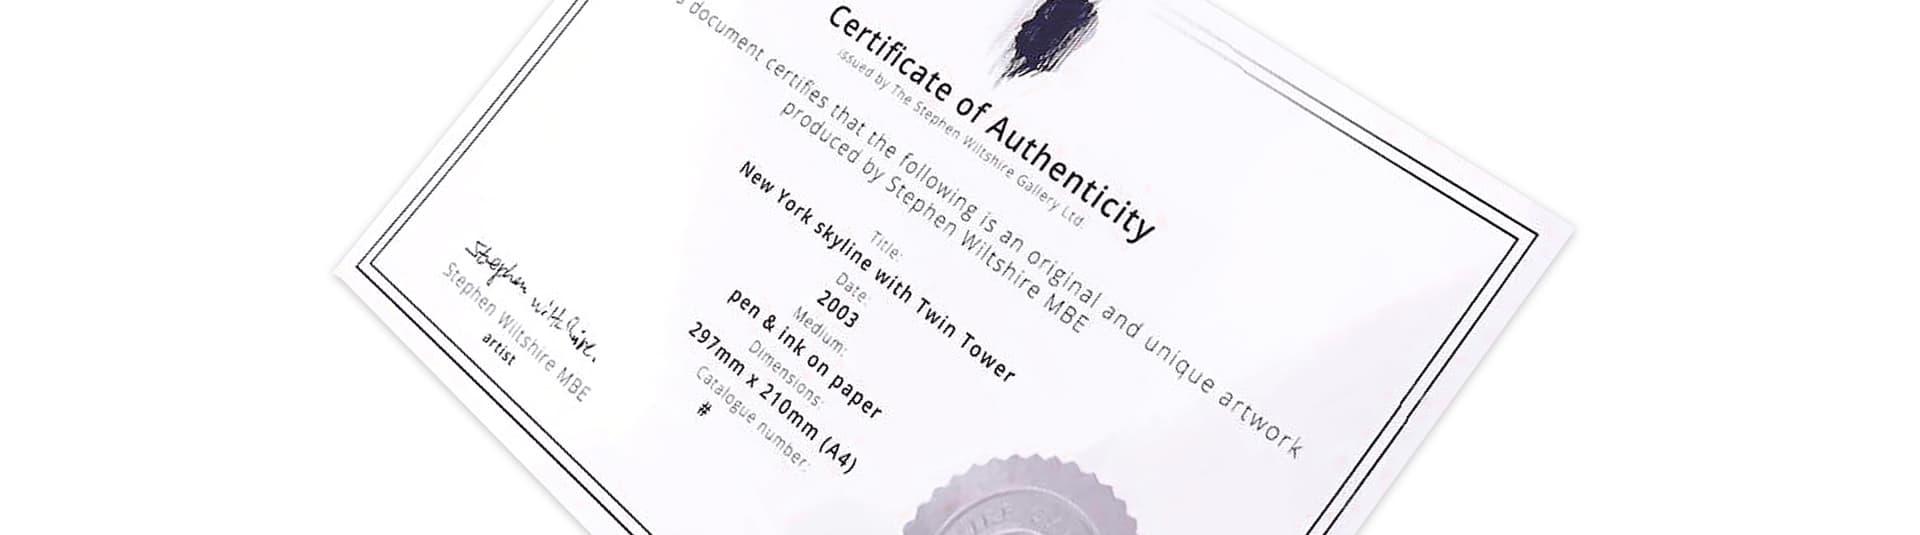 Certificate of Authenticity for Original Artworks